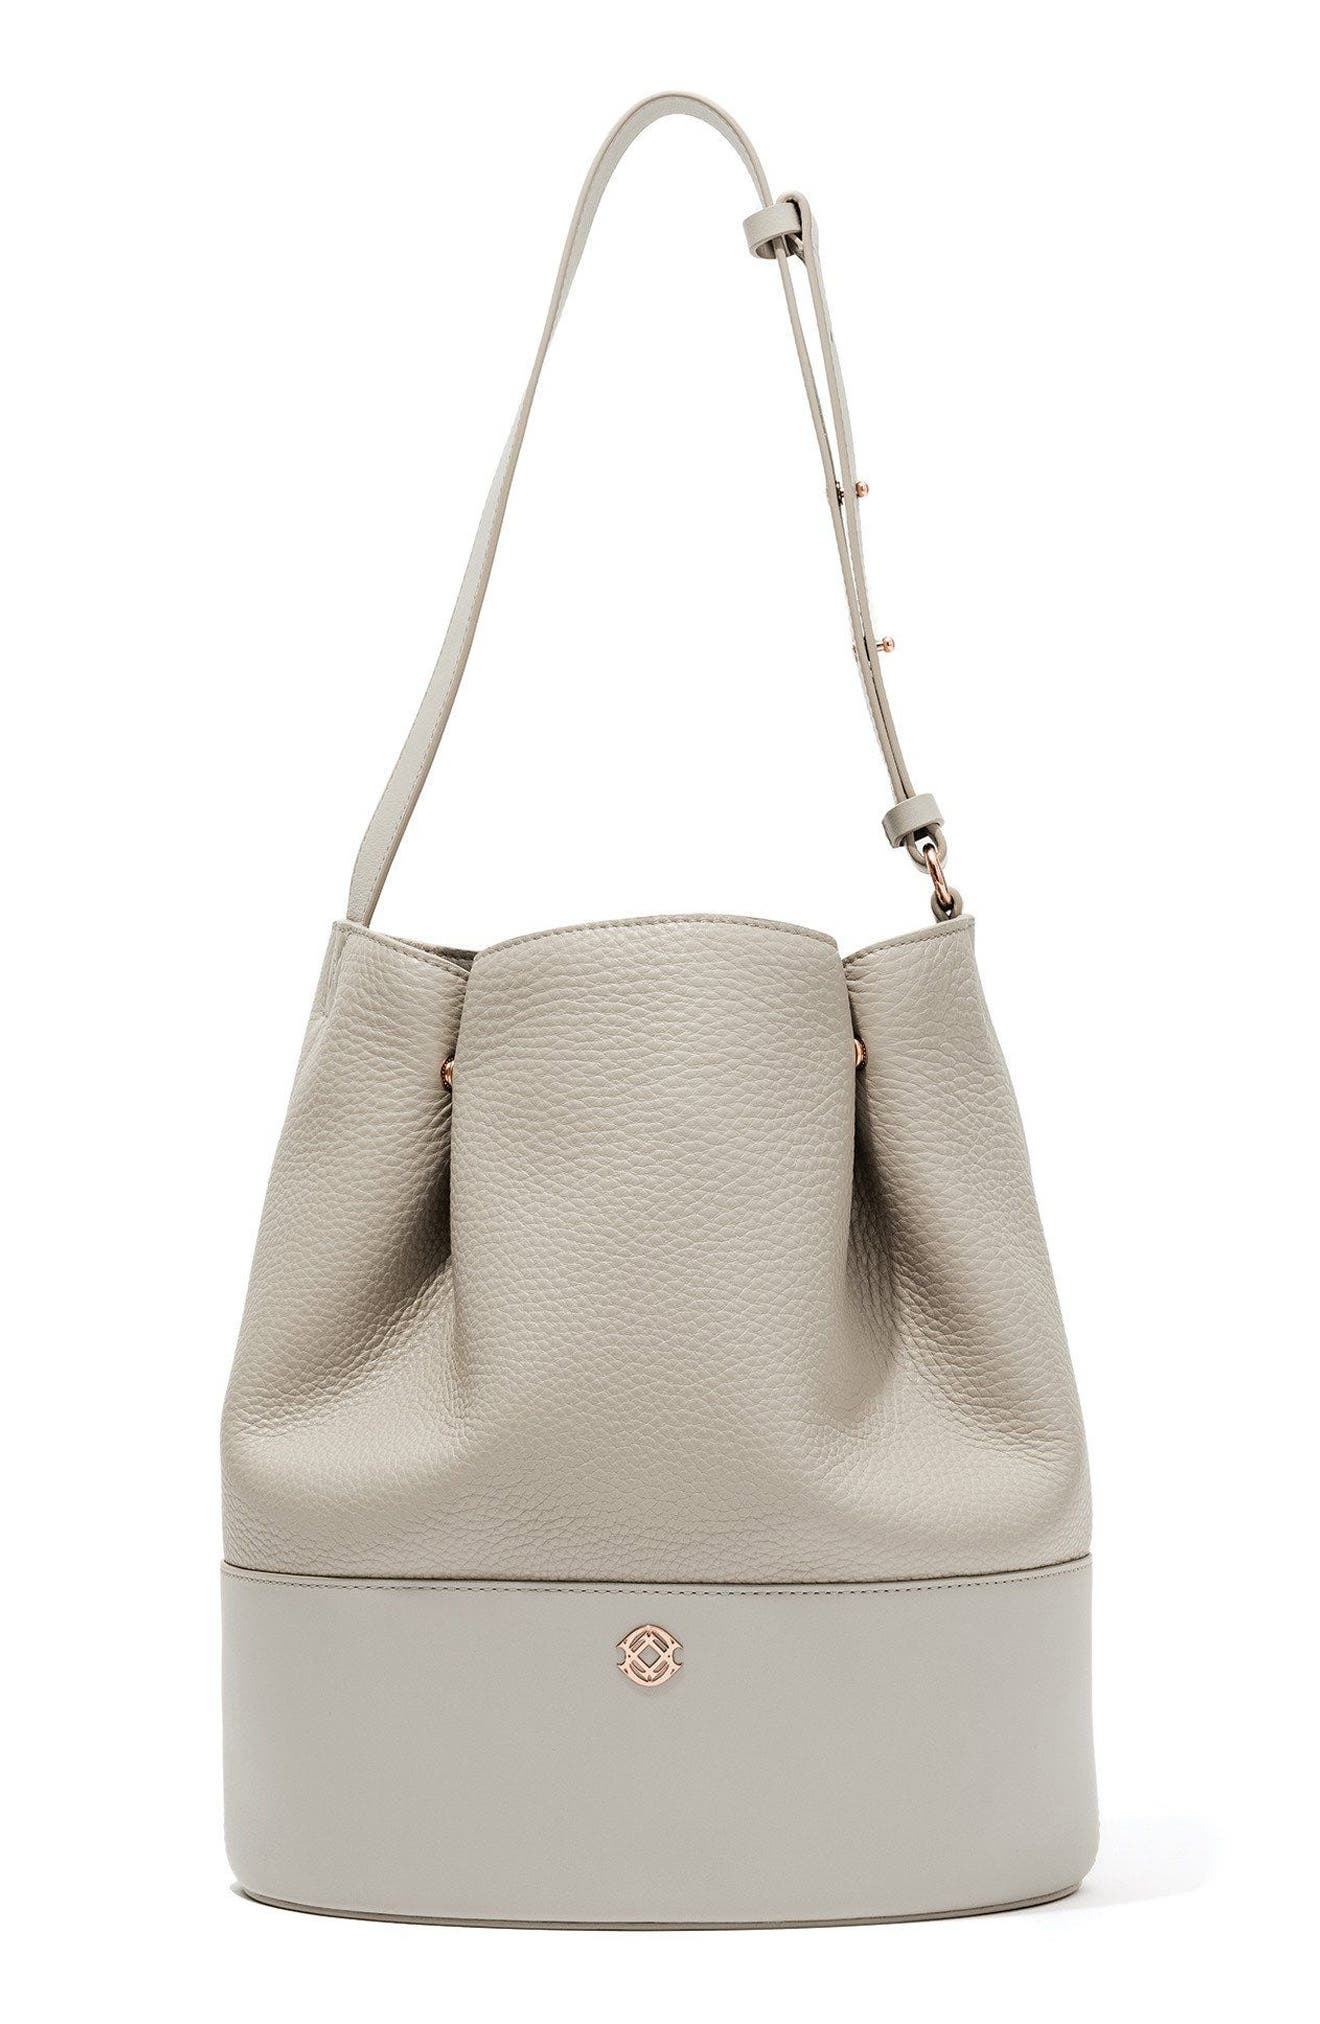 Ava Leather Bucket Bag, Main, color, BONE